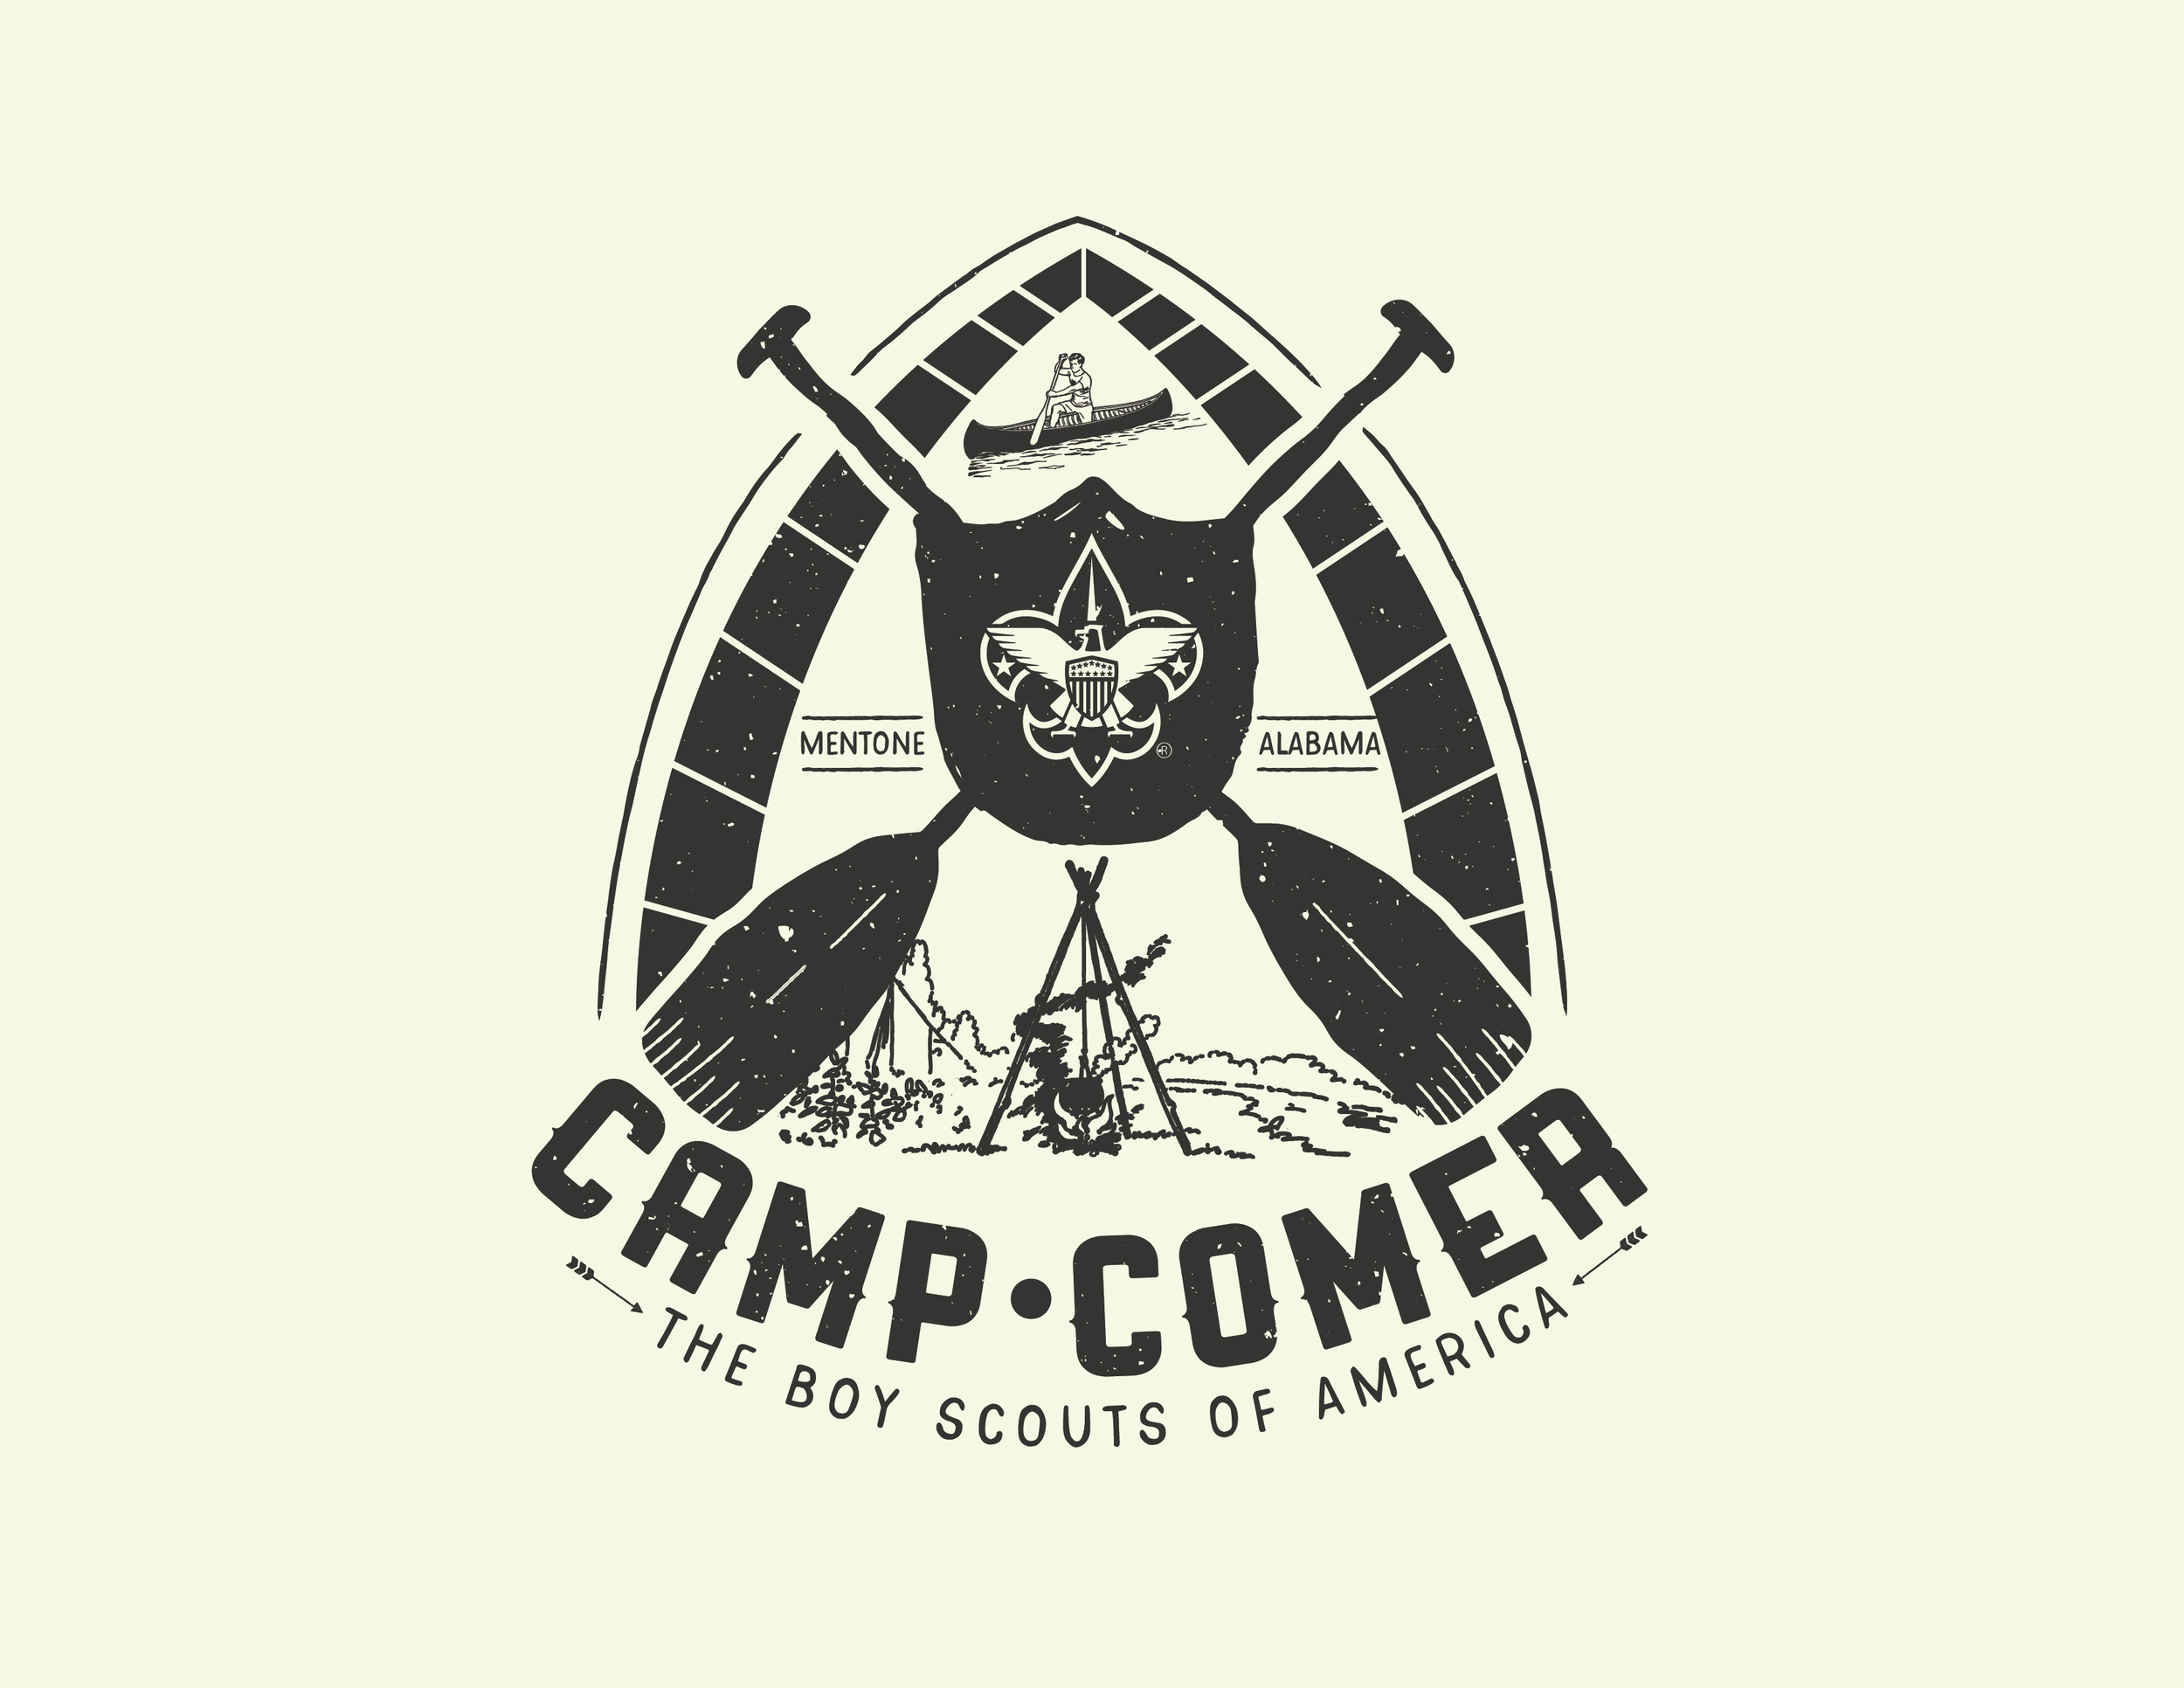 Camp_Comer_Shirts-02.jpg